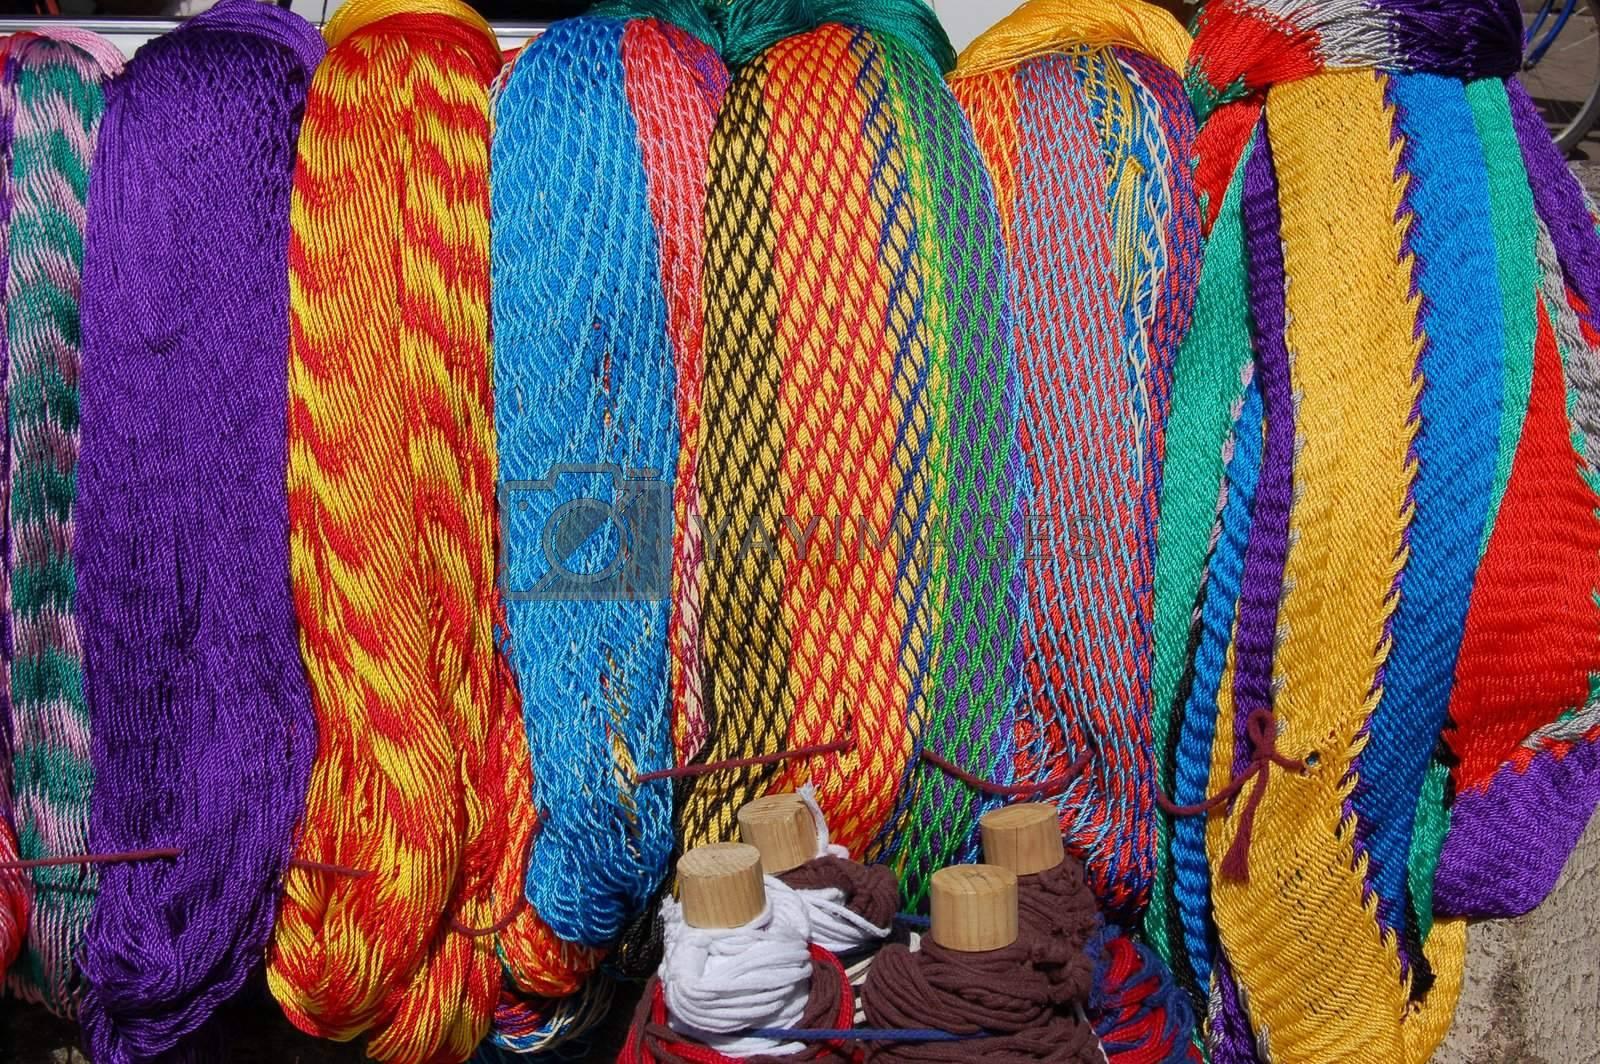 Hammocks for Sale in Chiapas by jorgeinthewater